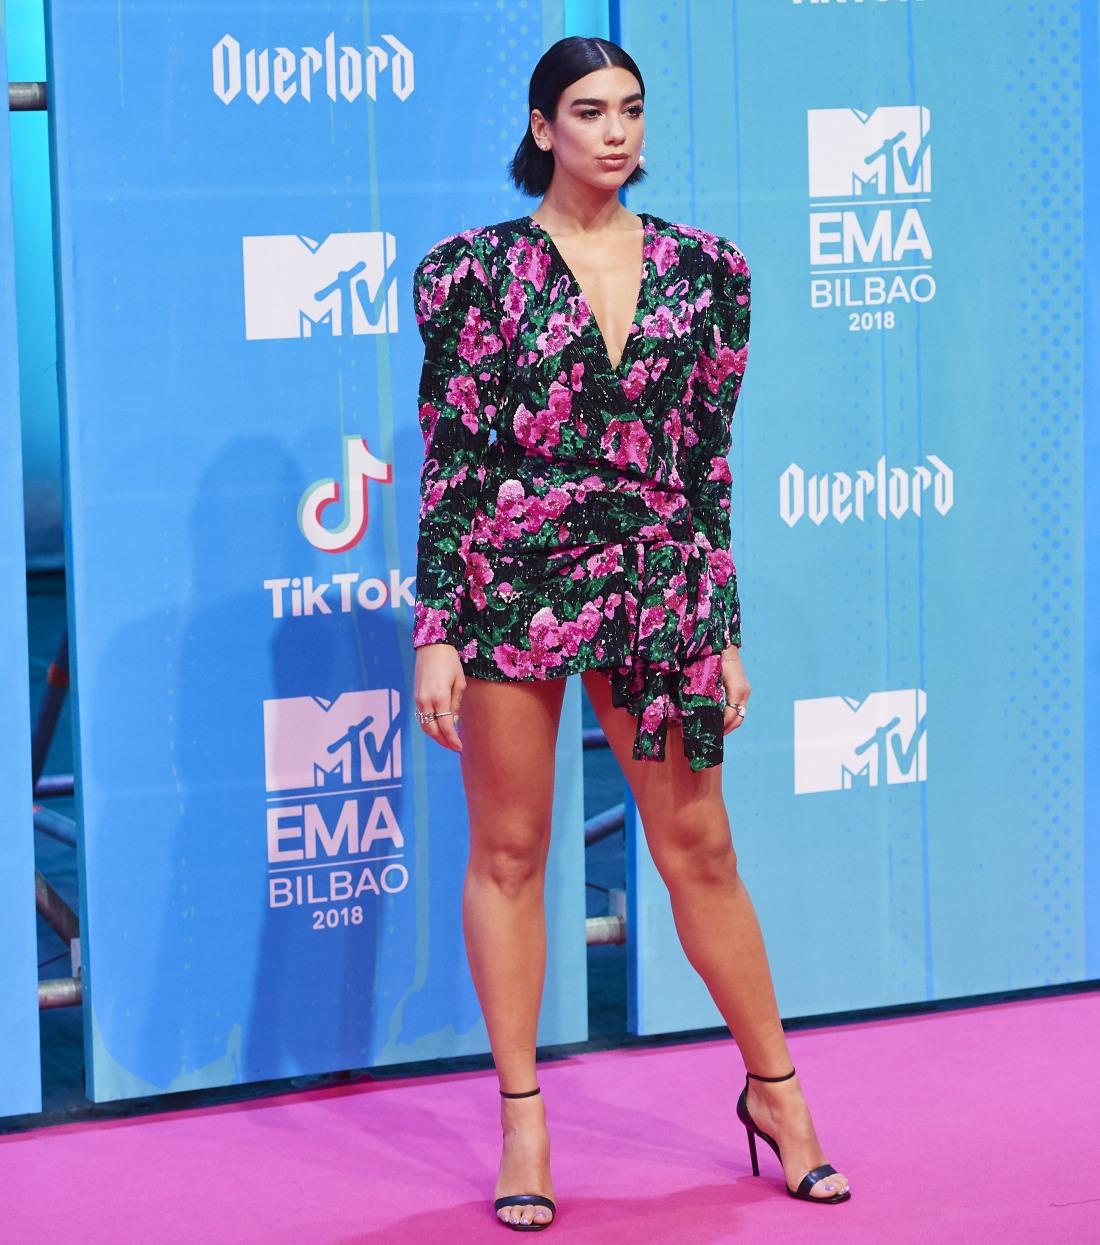 25th MTV Europe Music Awards EMAs 2018 - Red Carpet Arrivals